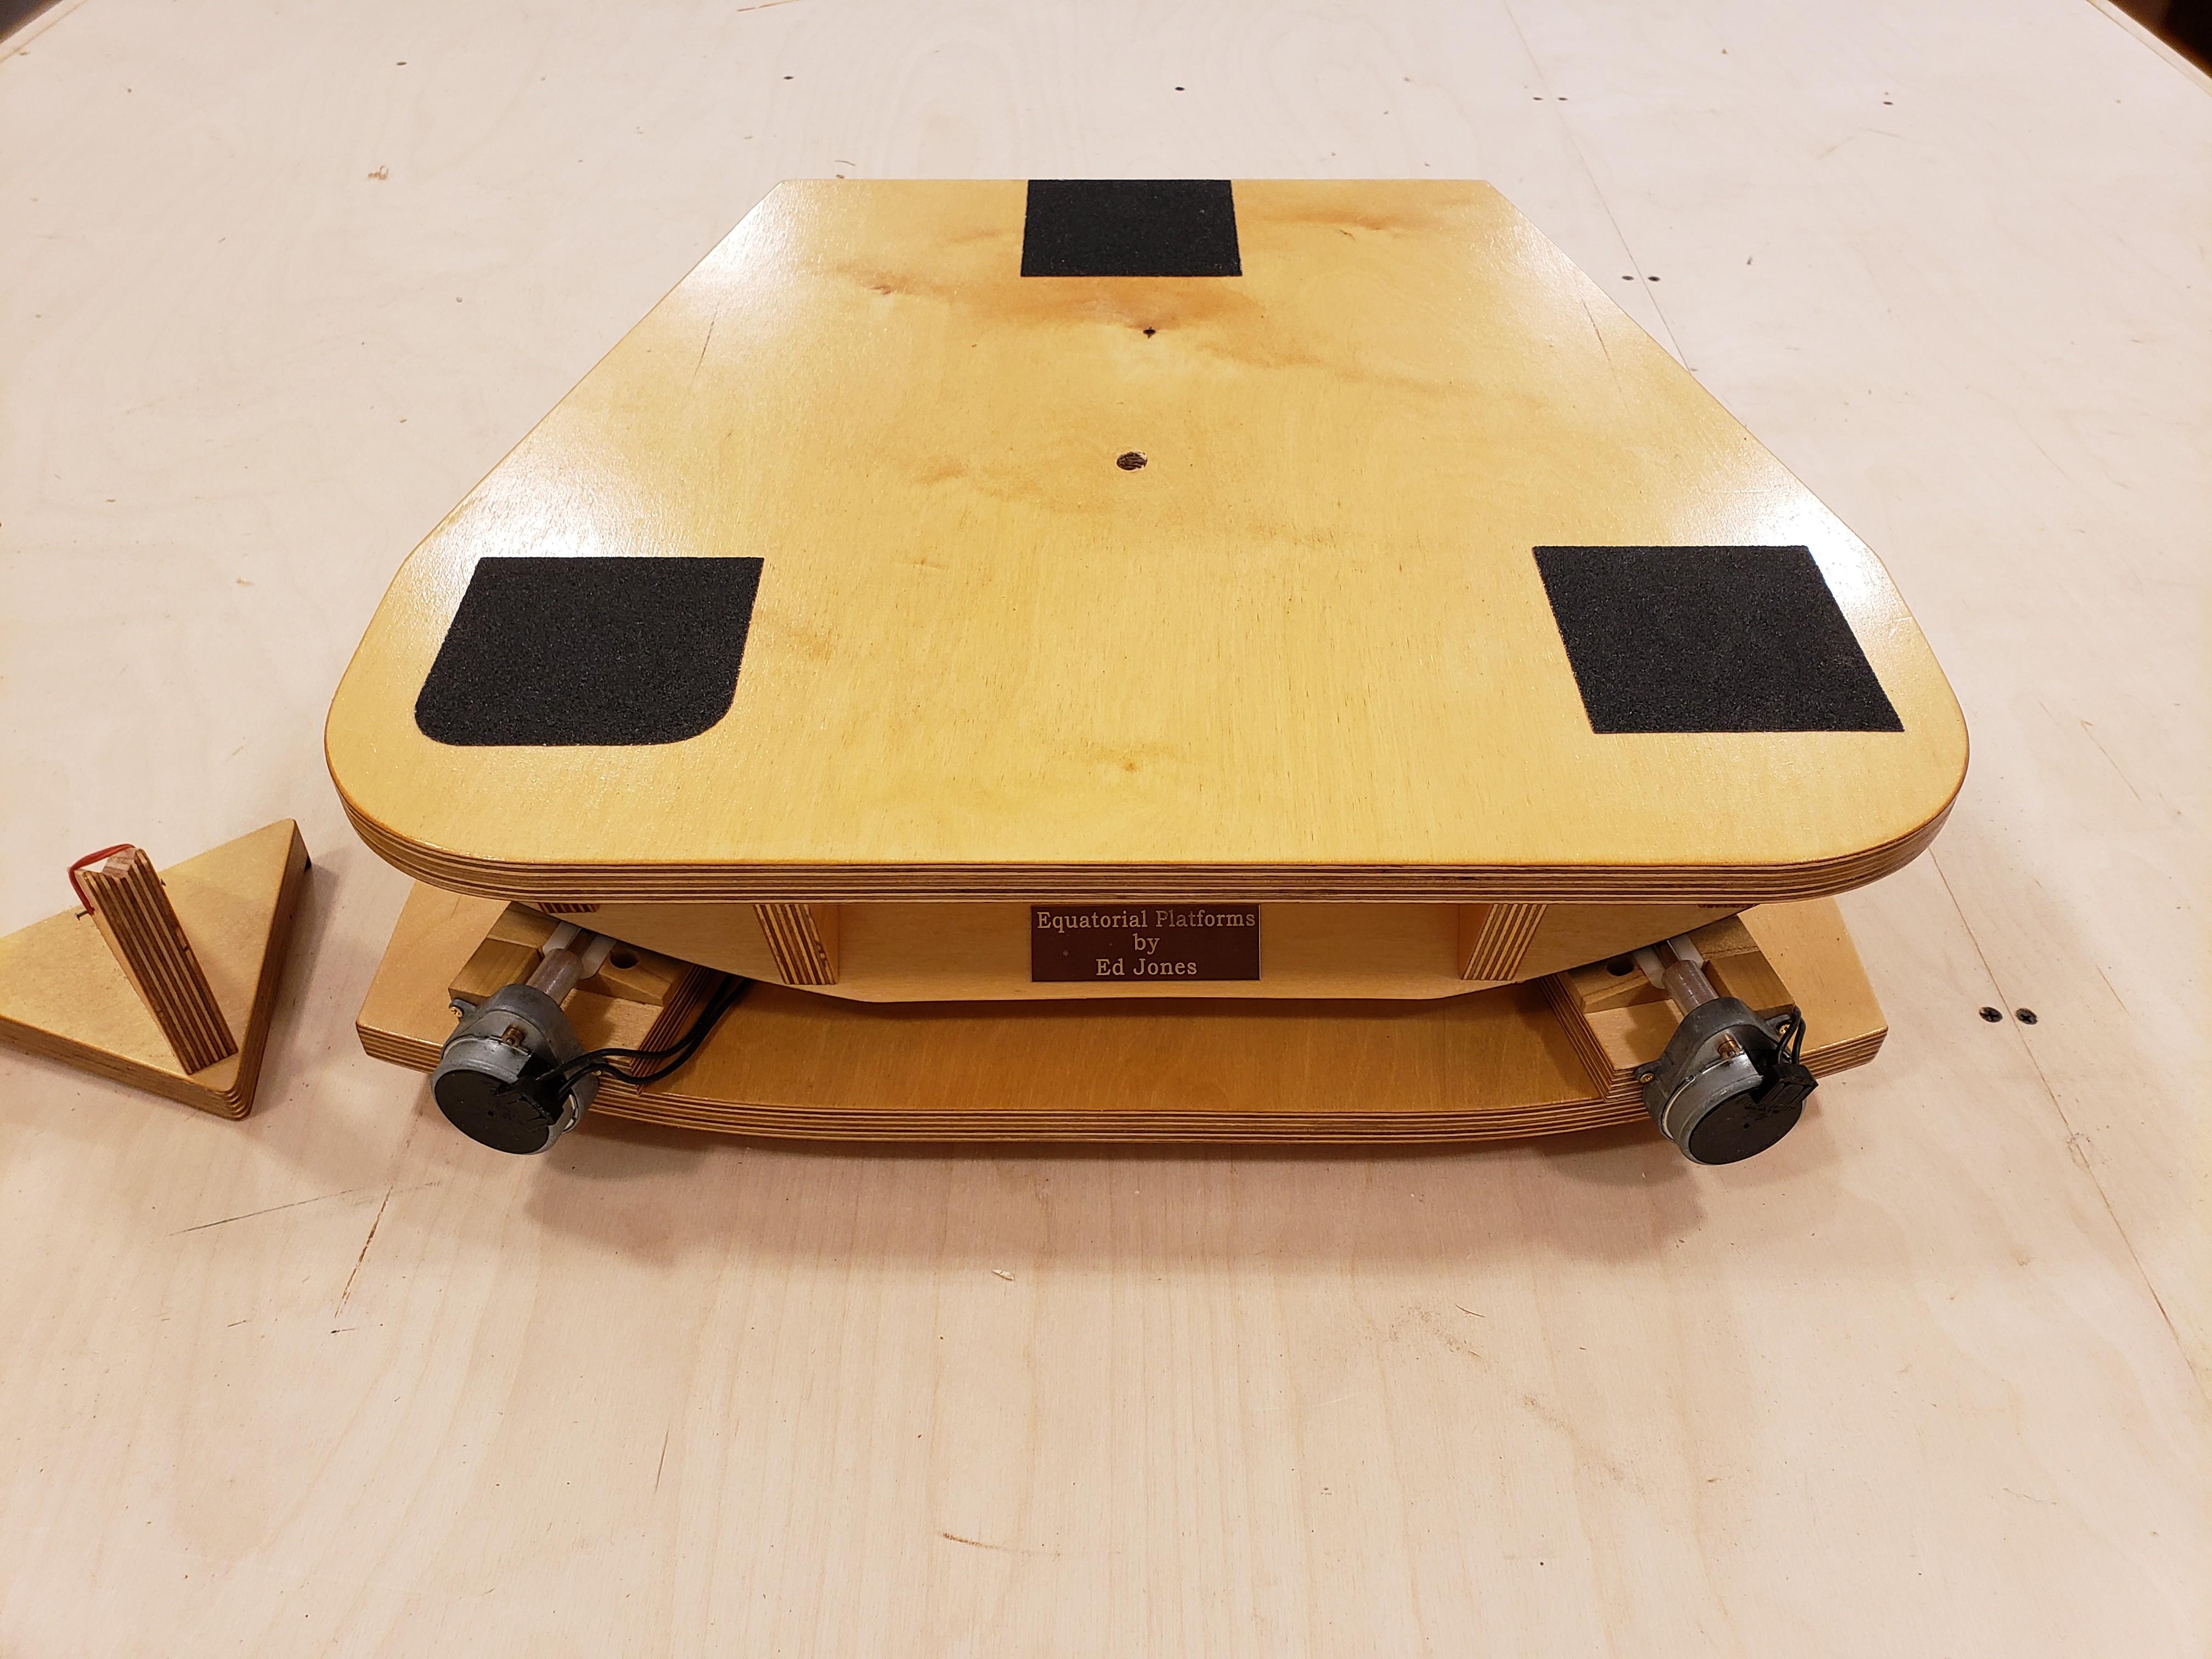 Ed Jones Login >> Ed Jones Equatorial Platform Astromart